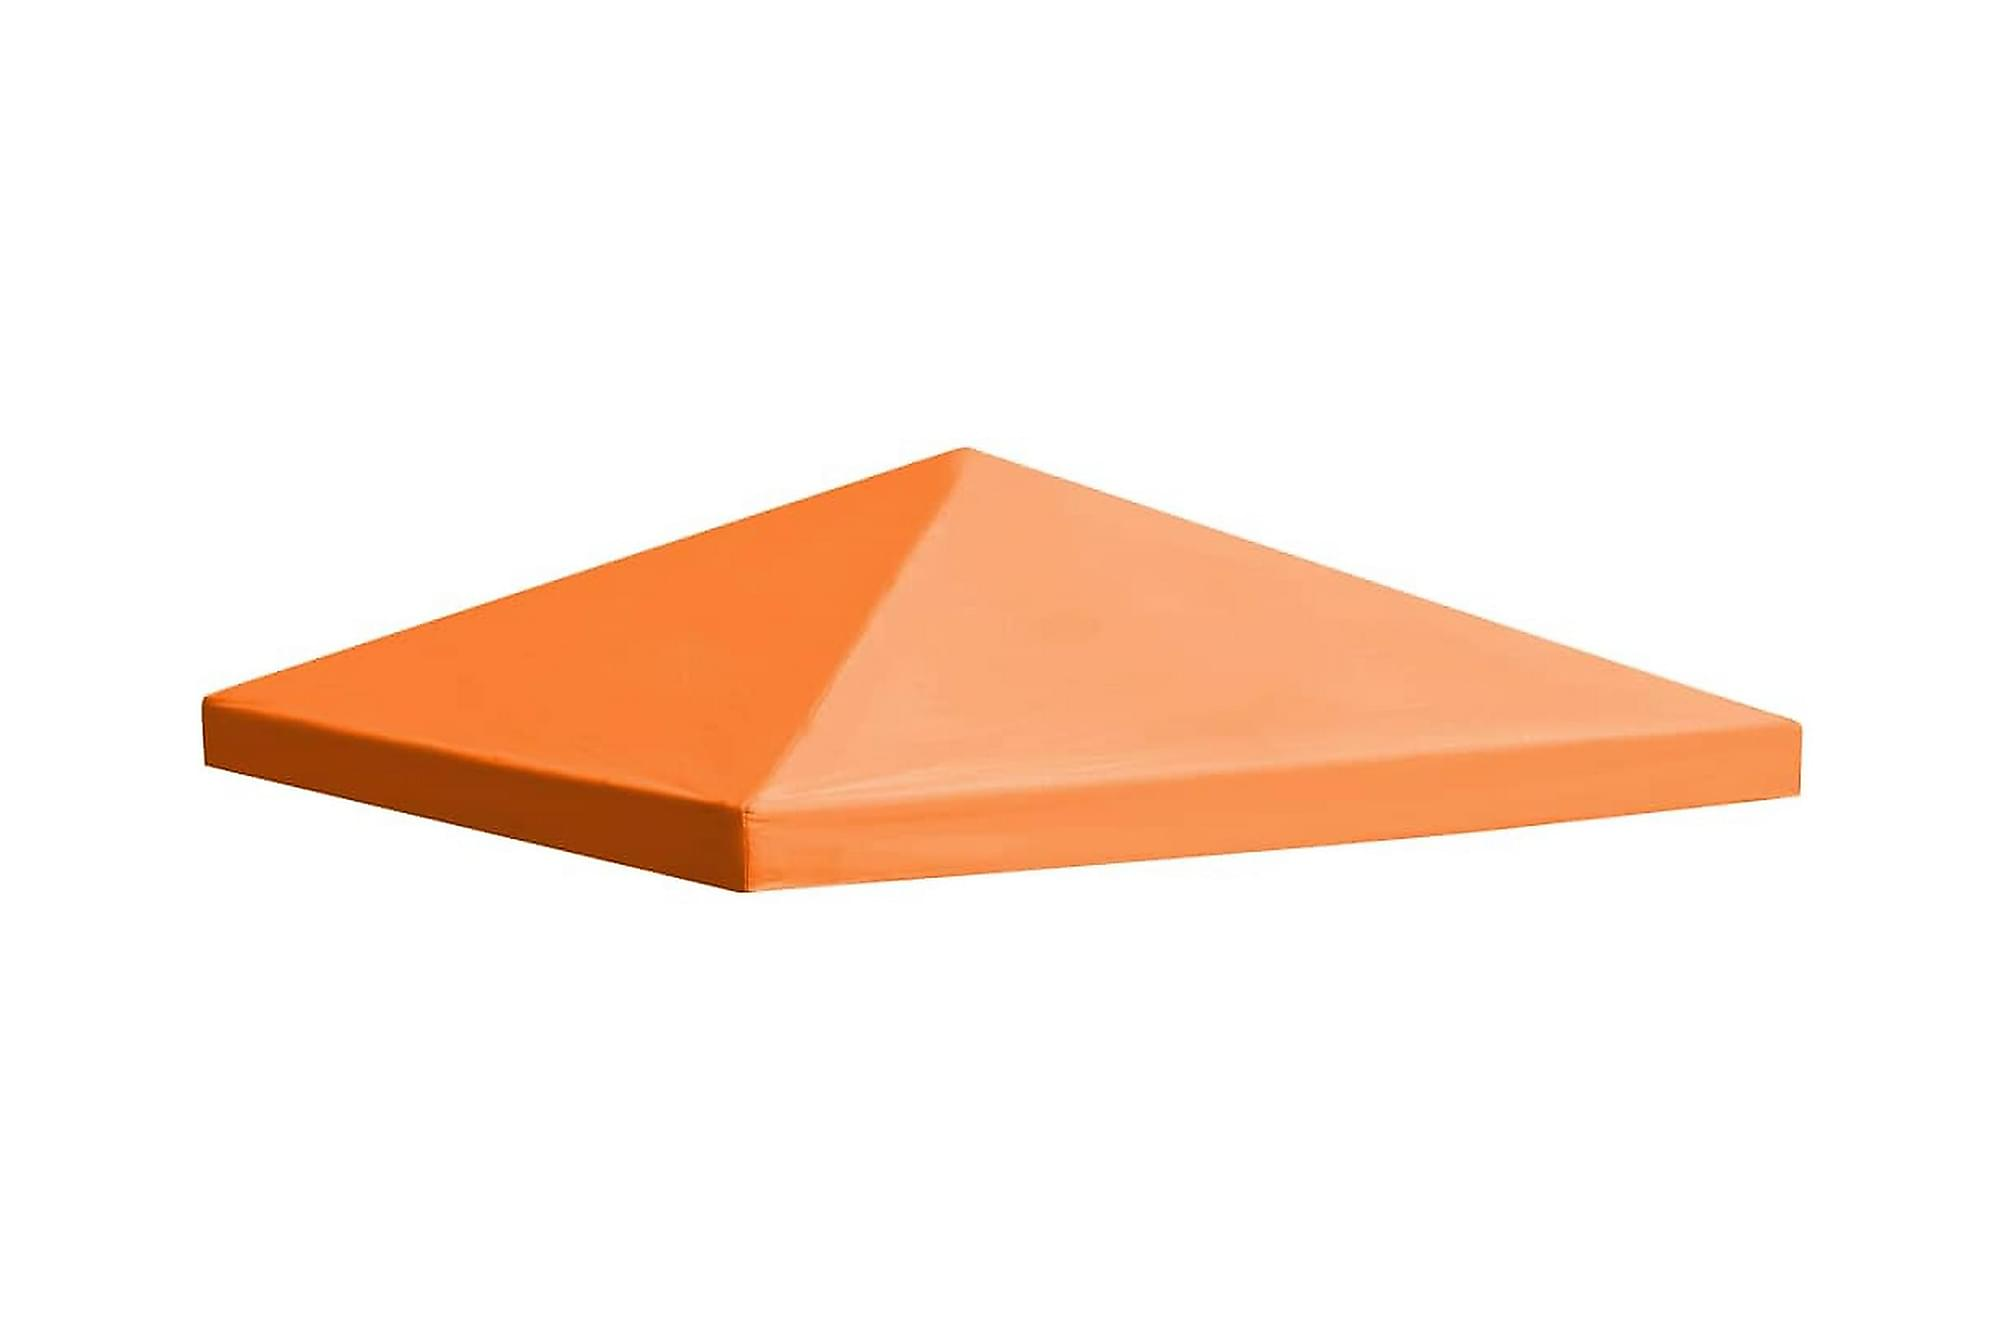 Paviljongtak 310 g/m2 3×3 m orange